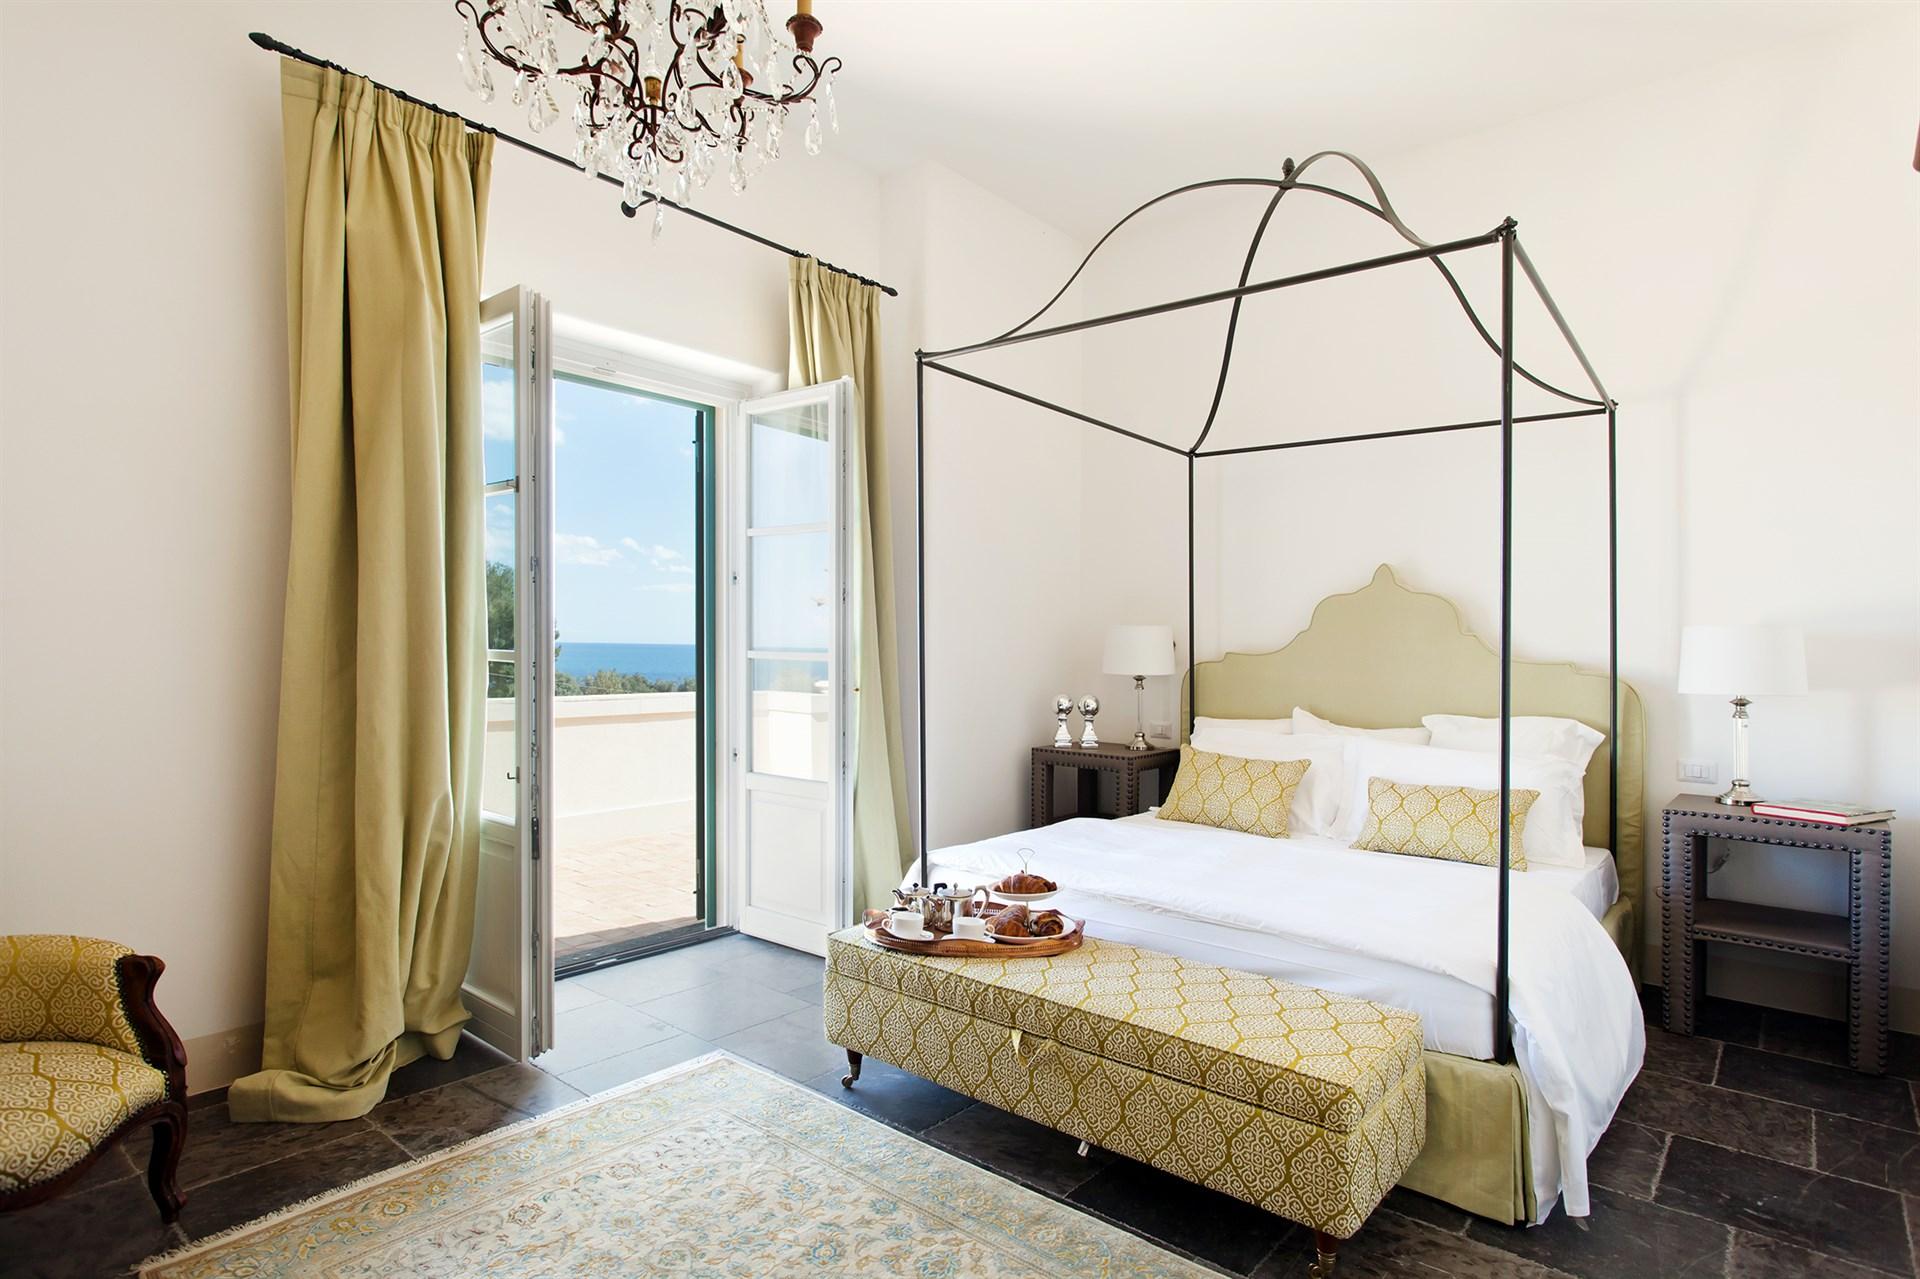 Villa Don Venerando: camera matrimoniale con letto a baldacchino